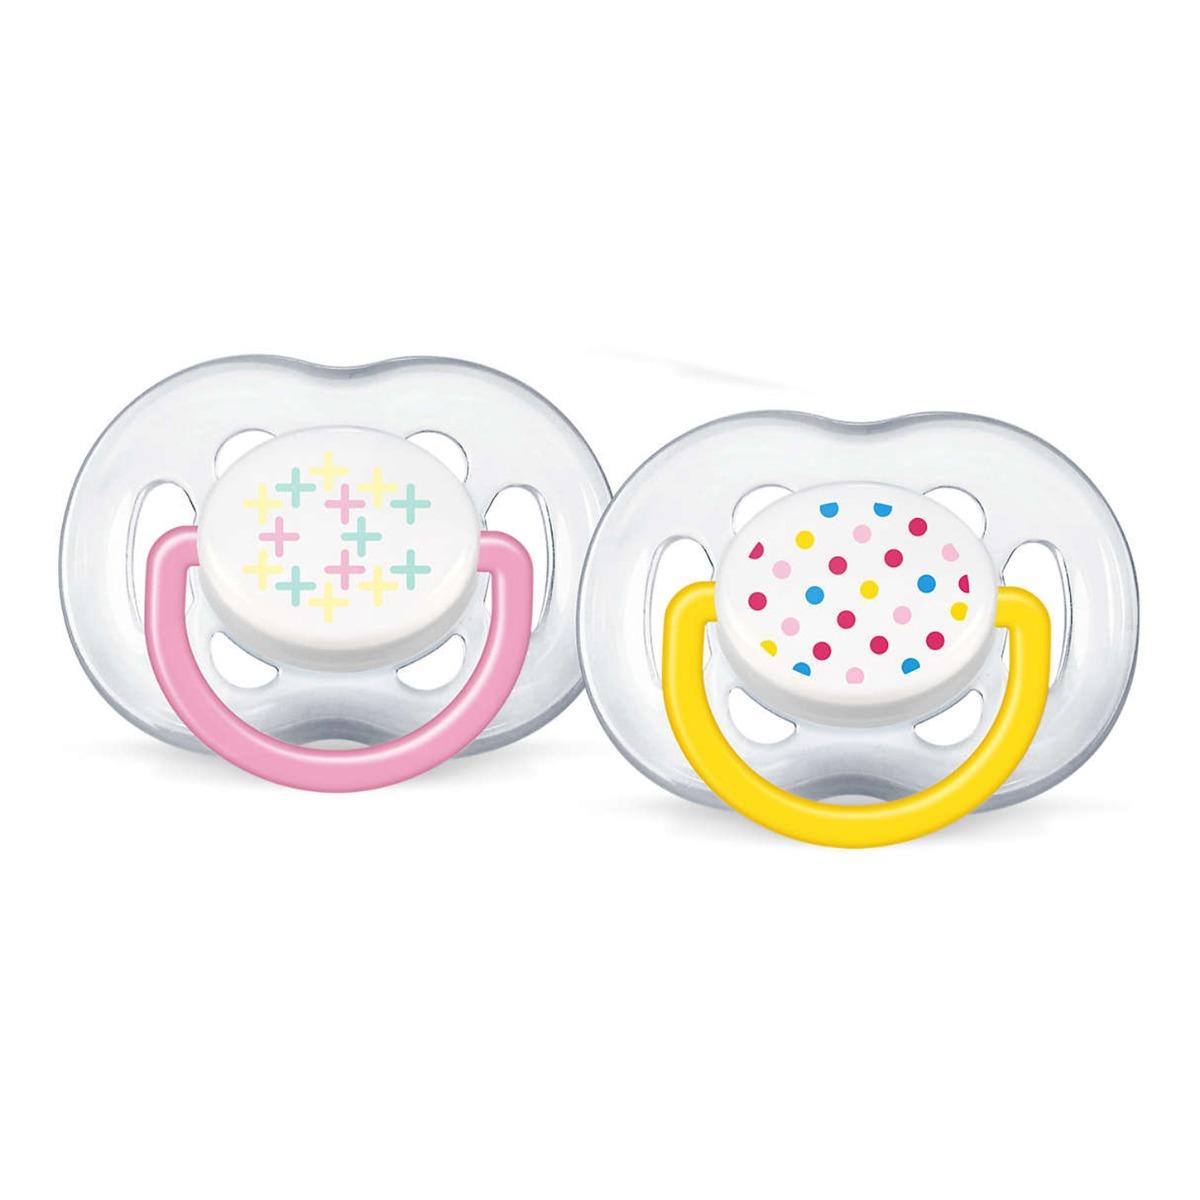 Set 2 suzete cu flux liber Philips Avent, tetina silicon, 6-18 luni, Galben/Roz imagine